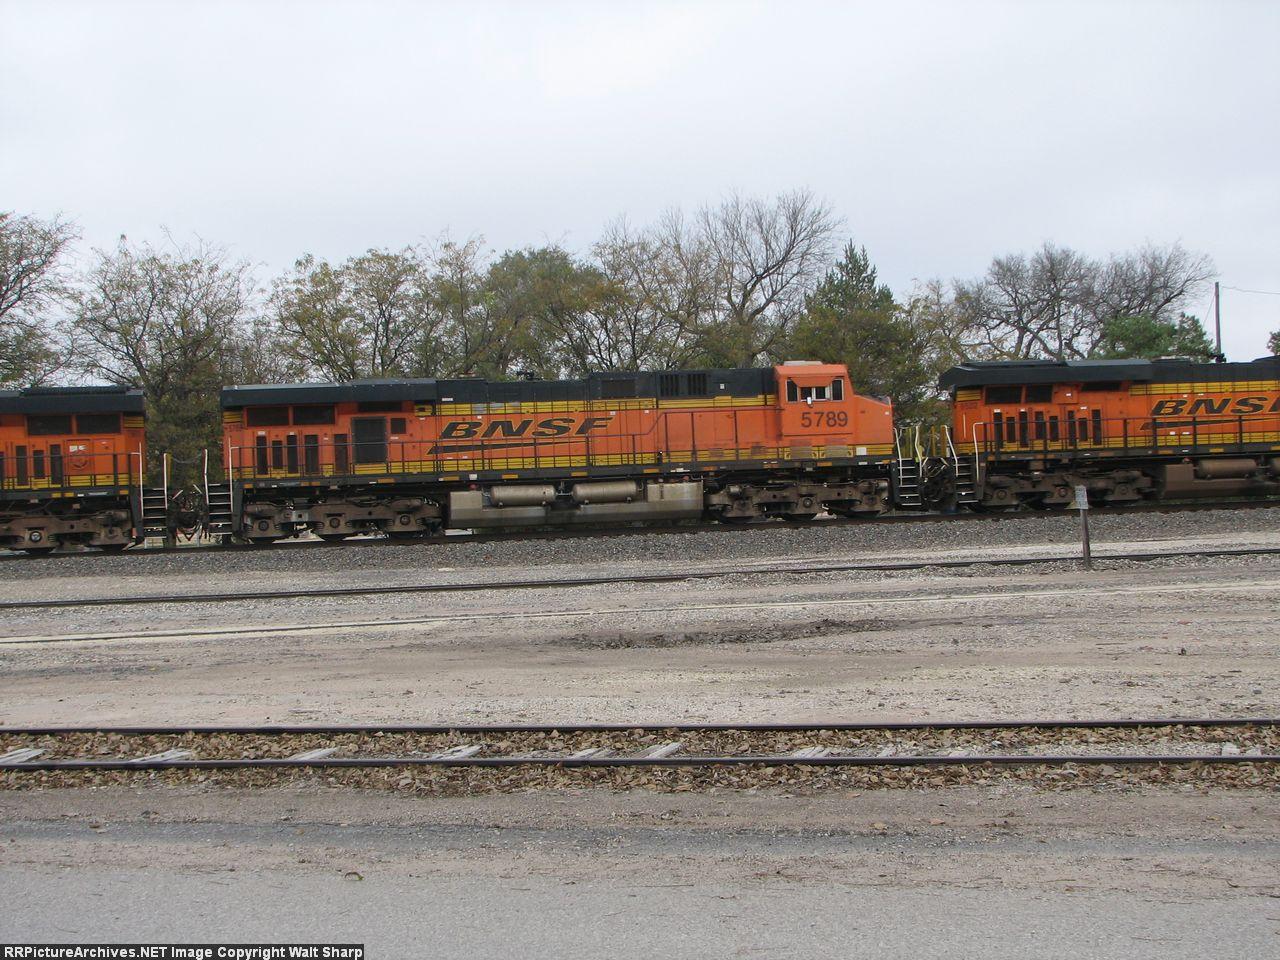 BNSF 5789